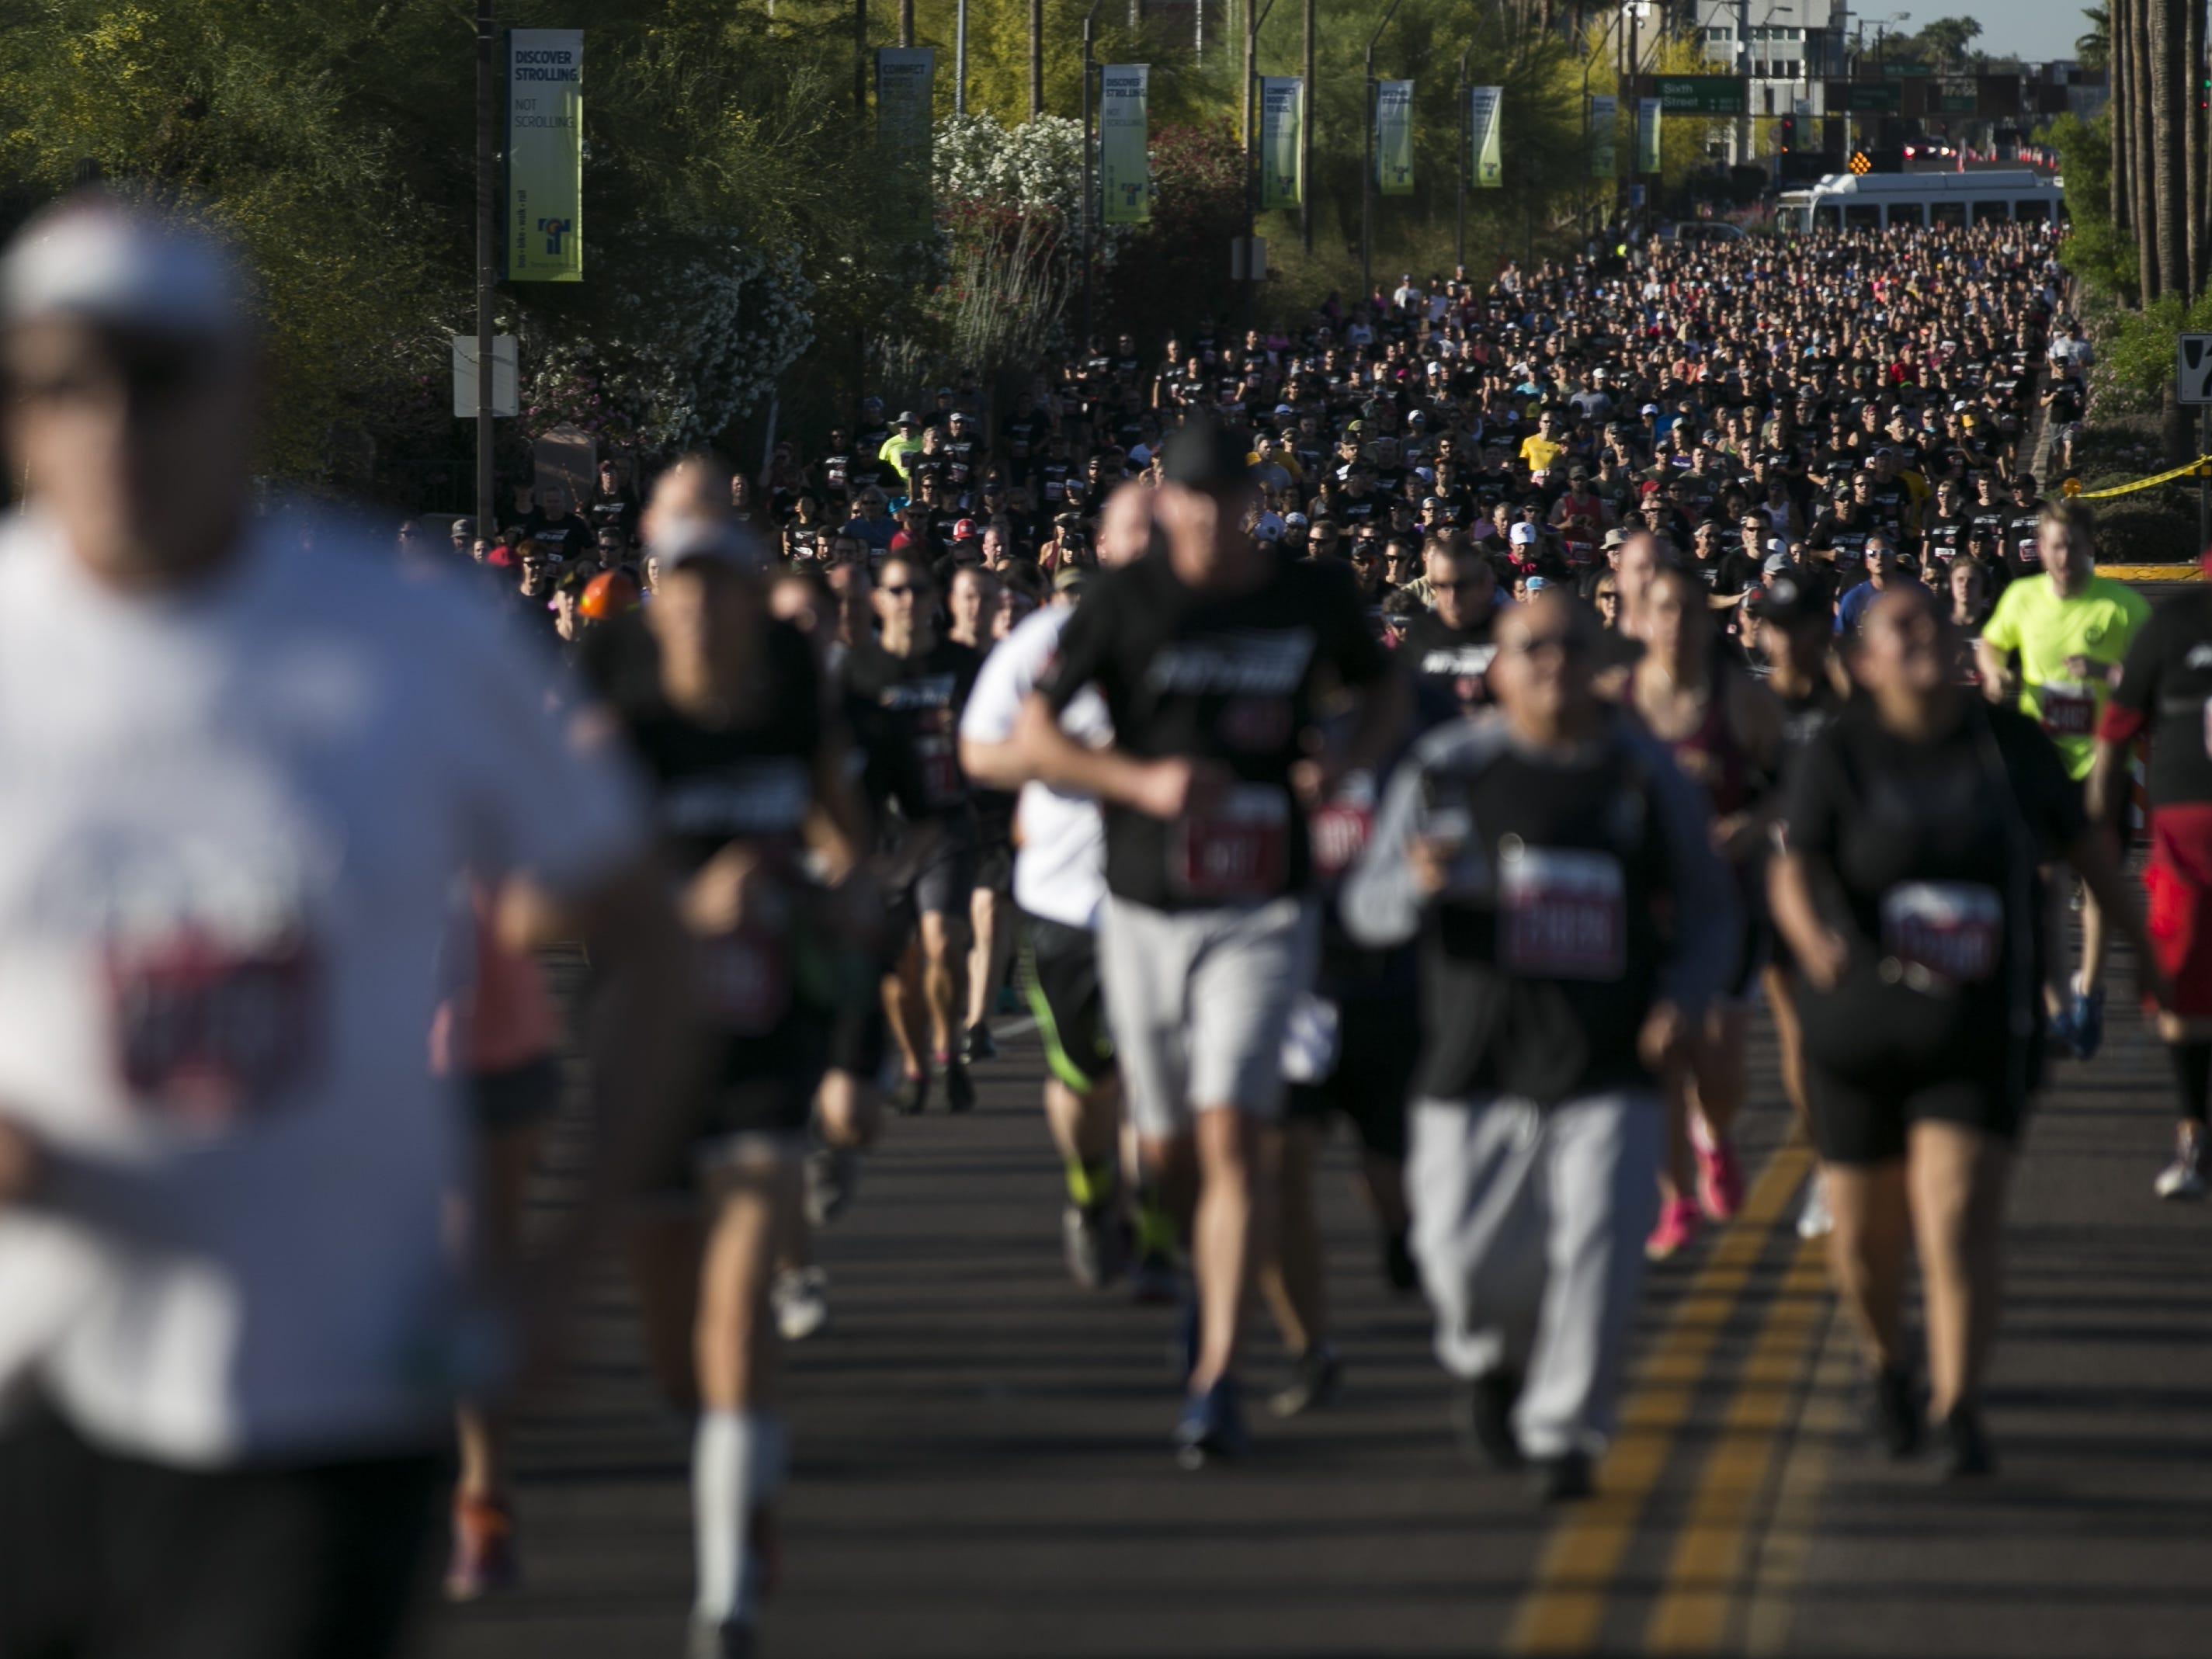 Runners participate in Pat's Run 2019 in Tempe on April 27, 2019.